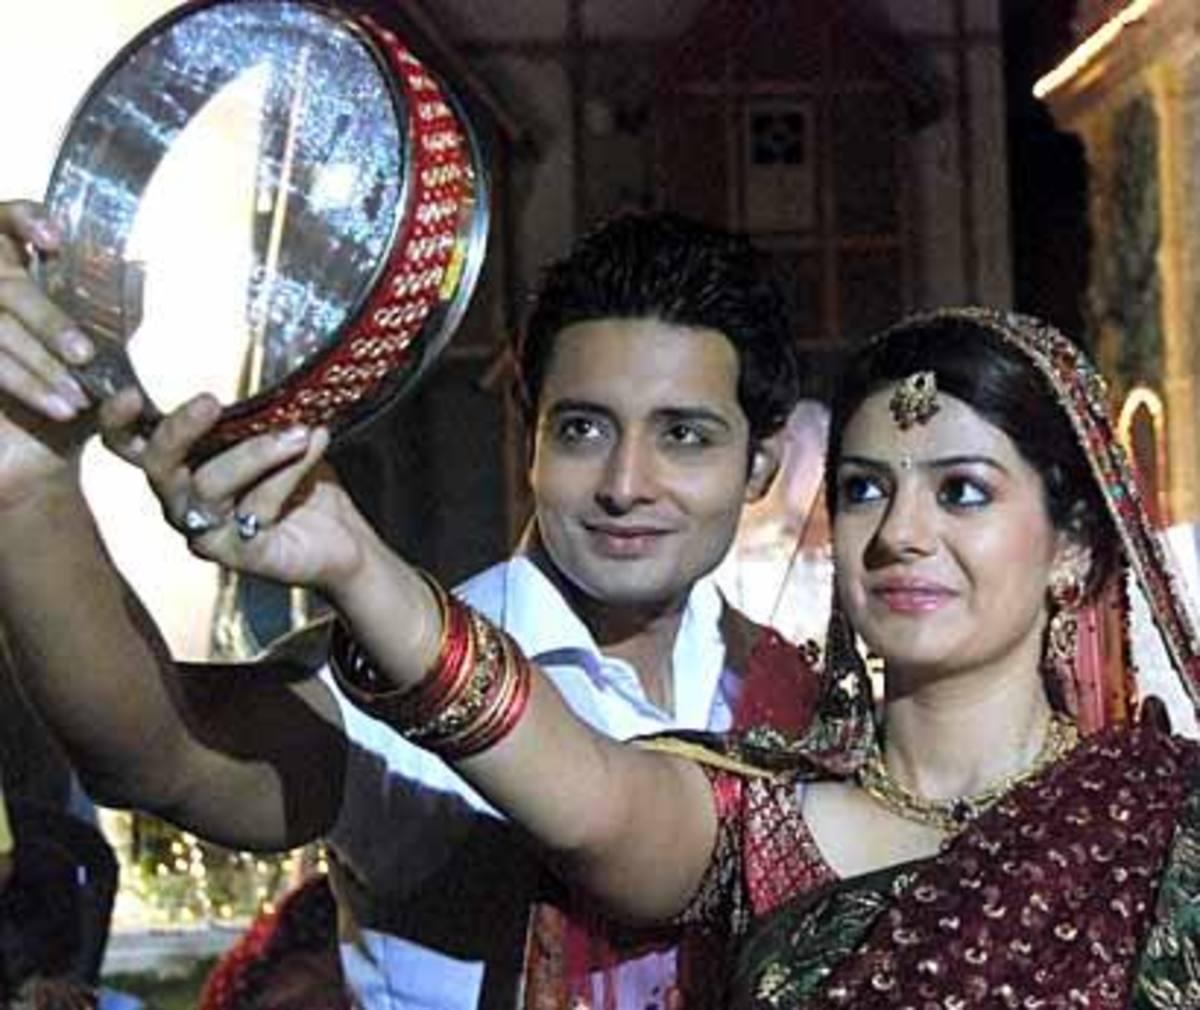 Divya and Siddharth during Karva Chauth